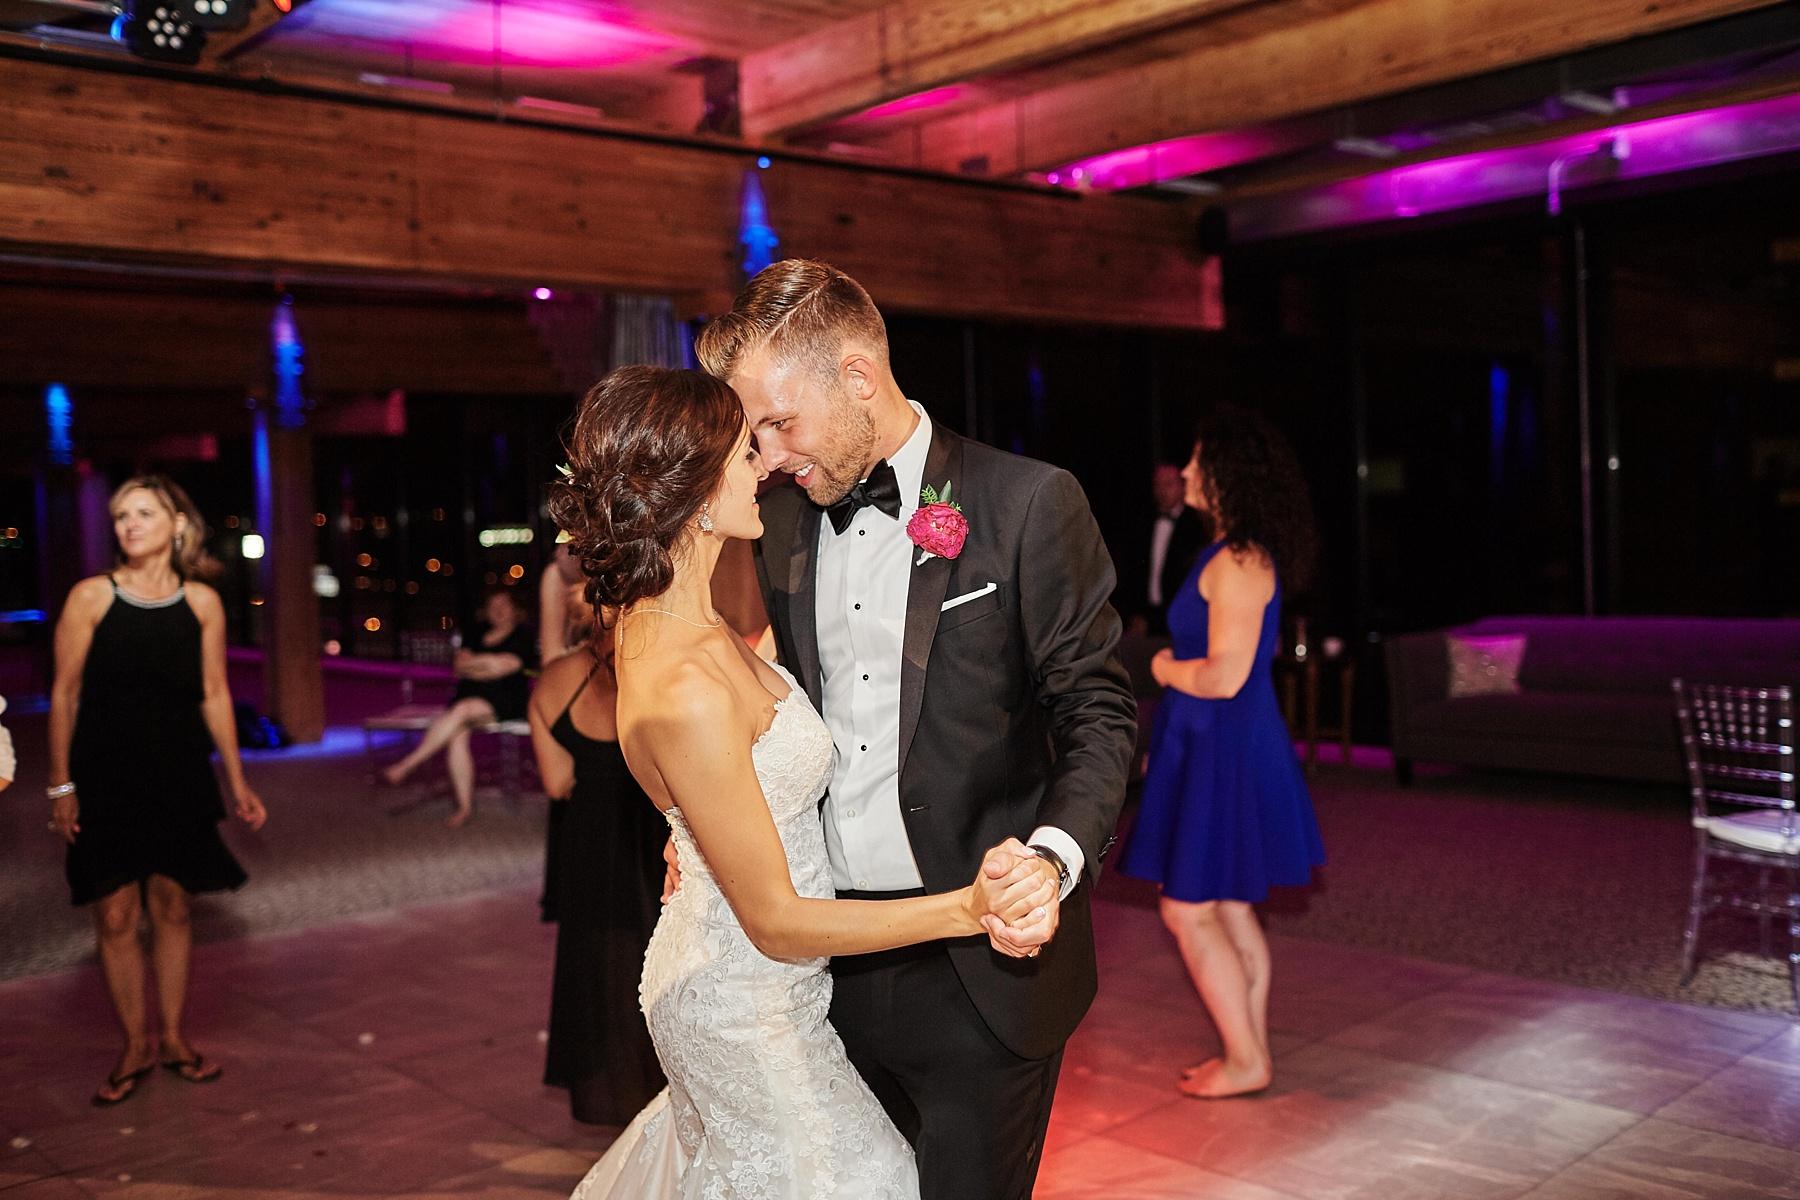 ABULAE-Wedding-Saint-paul-MN-Josh-Sofia-Wedding-Mears-Park_0870.jpg